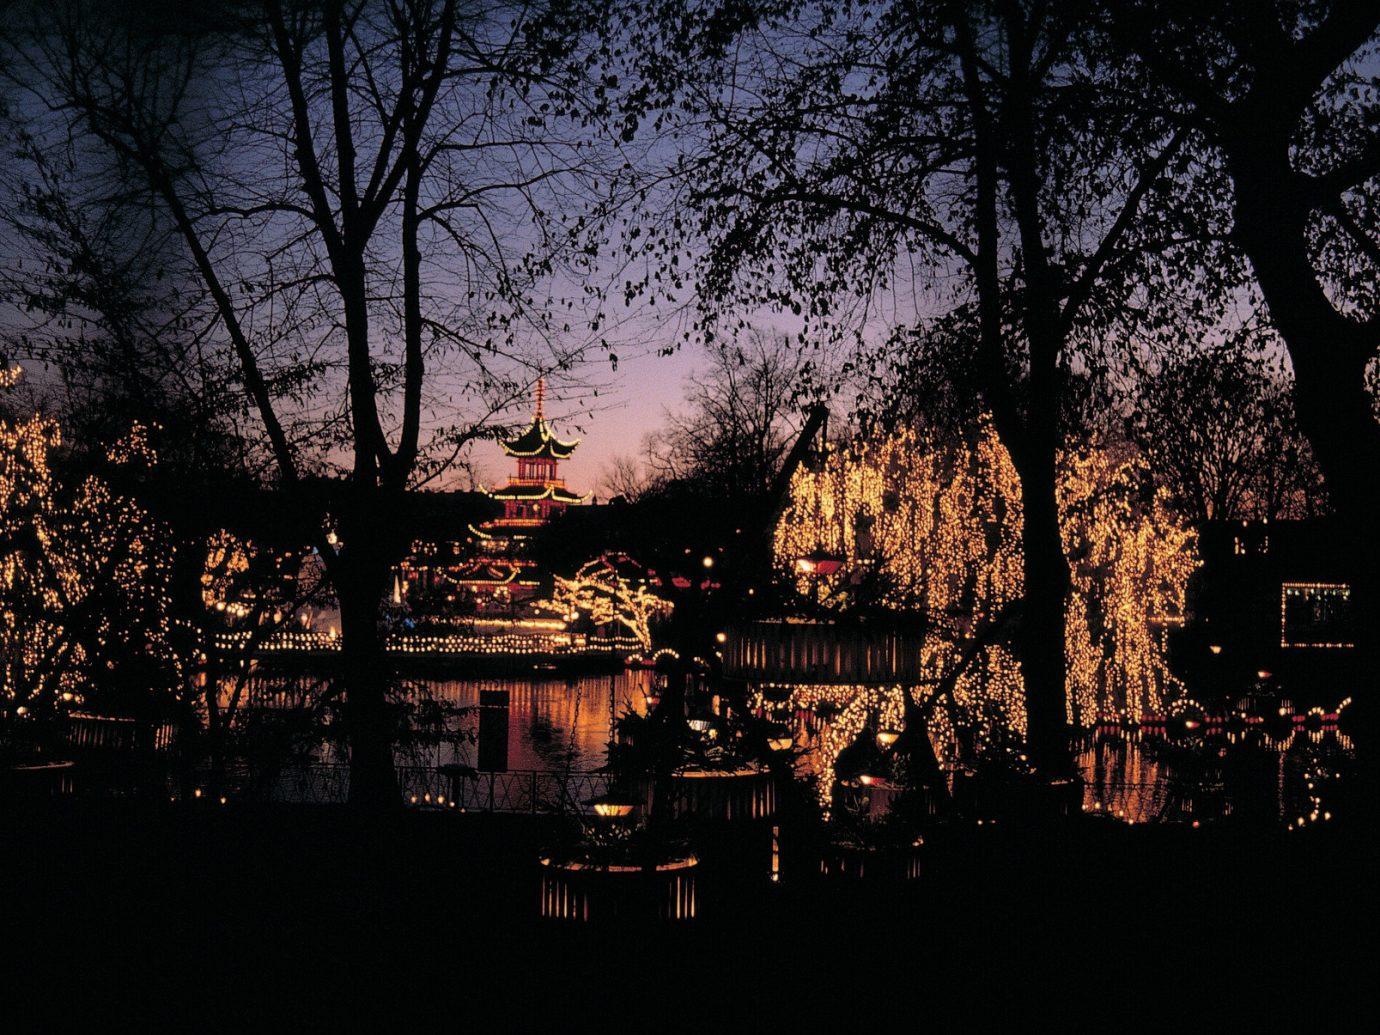 Trip Ideas tree outdoor night light evening darkness morning Sunset woody plant dusk lighting reflection autumn flower cityscape plant